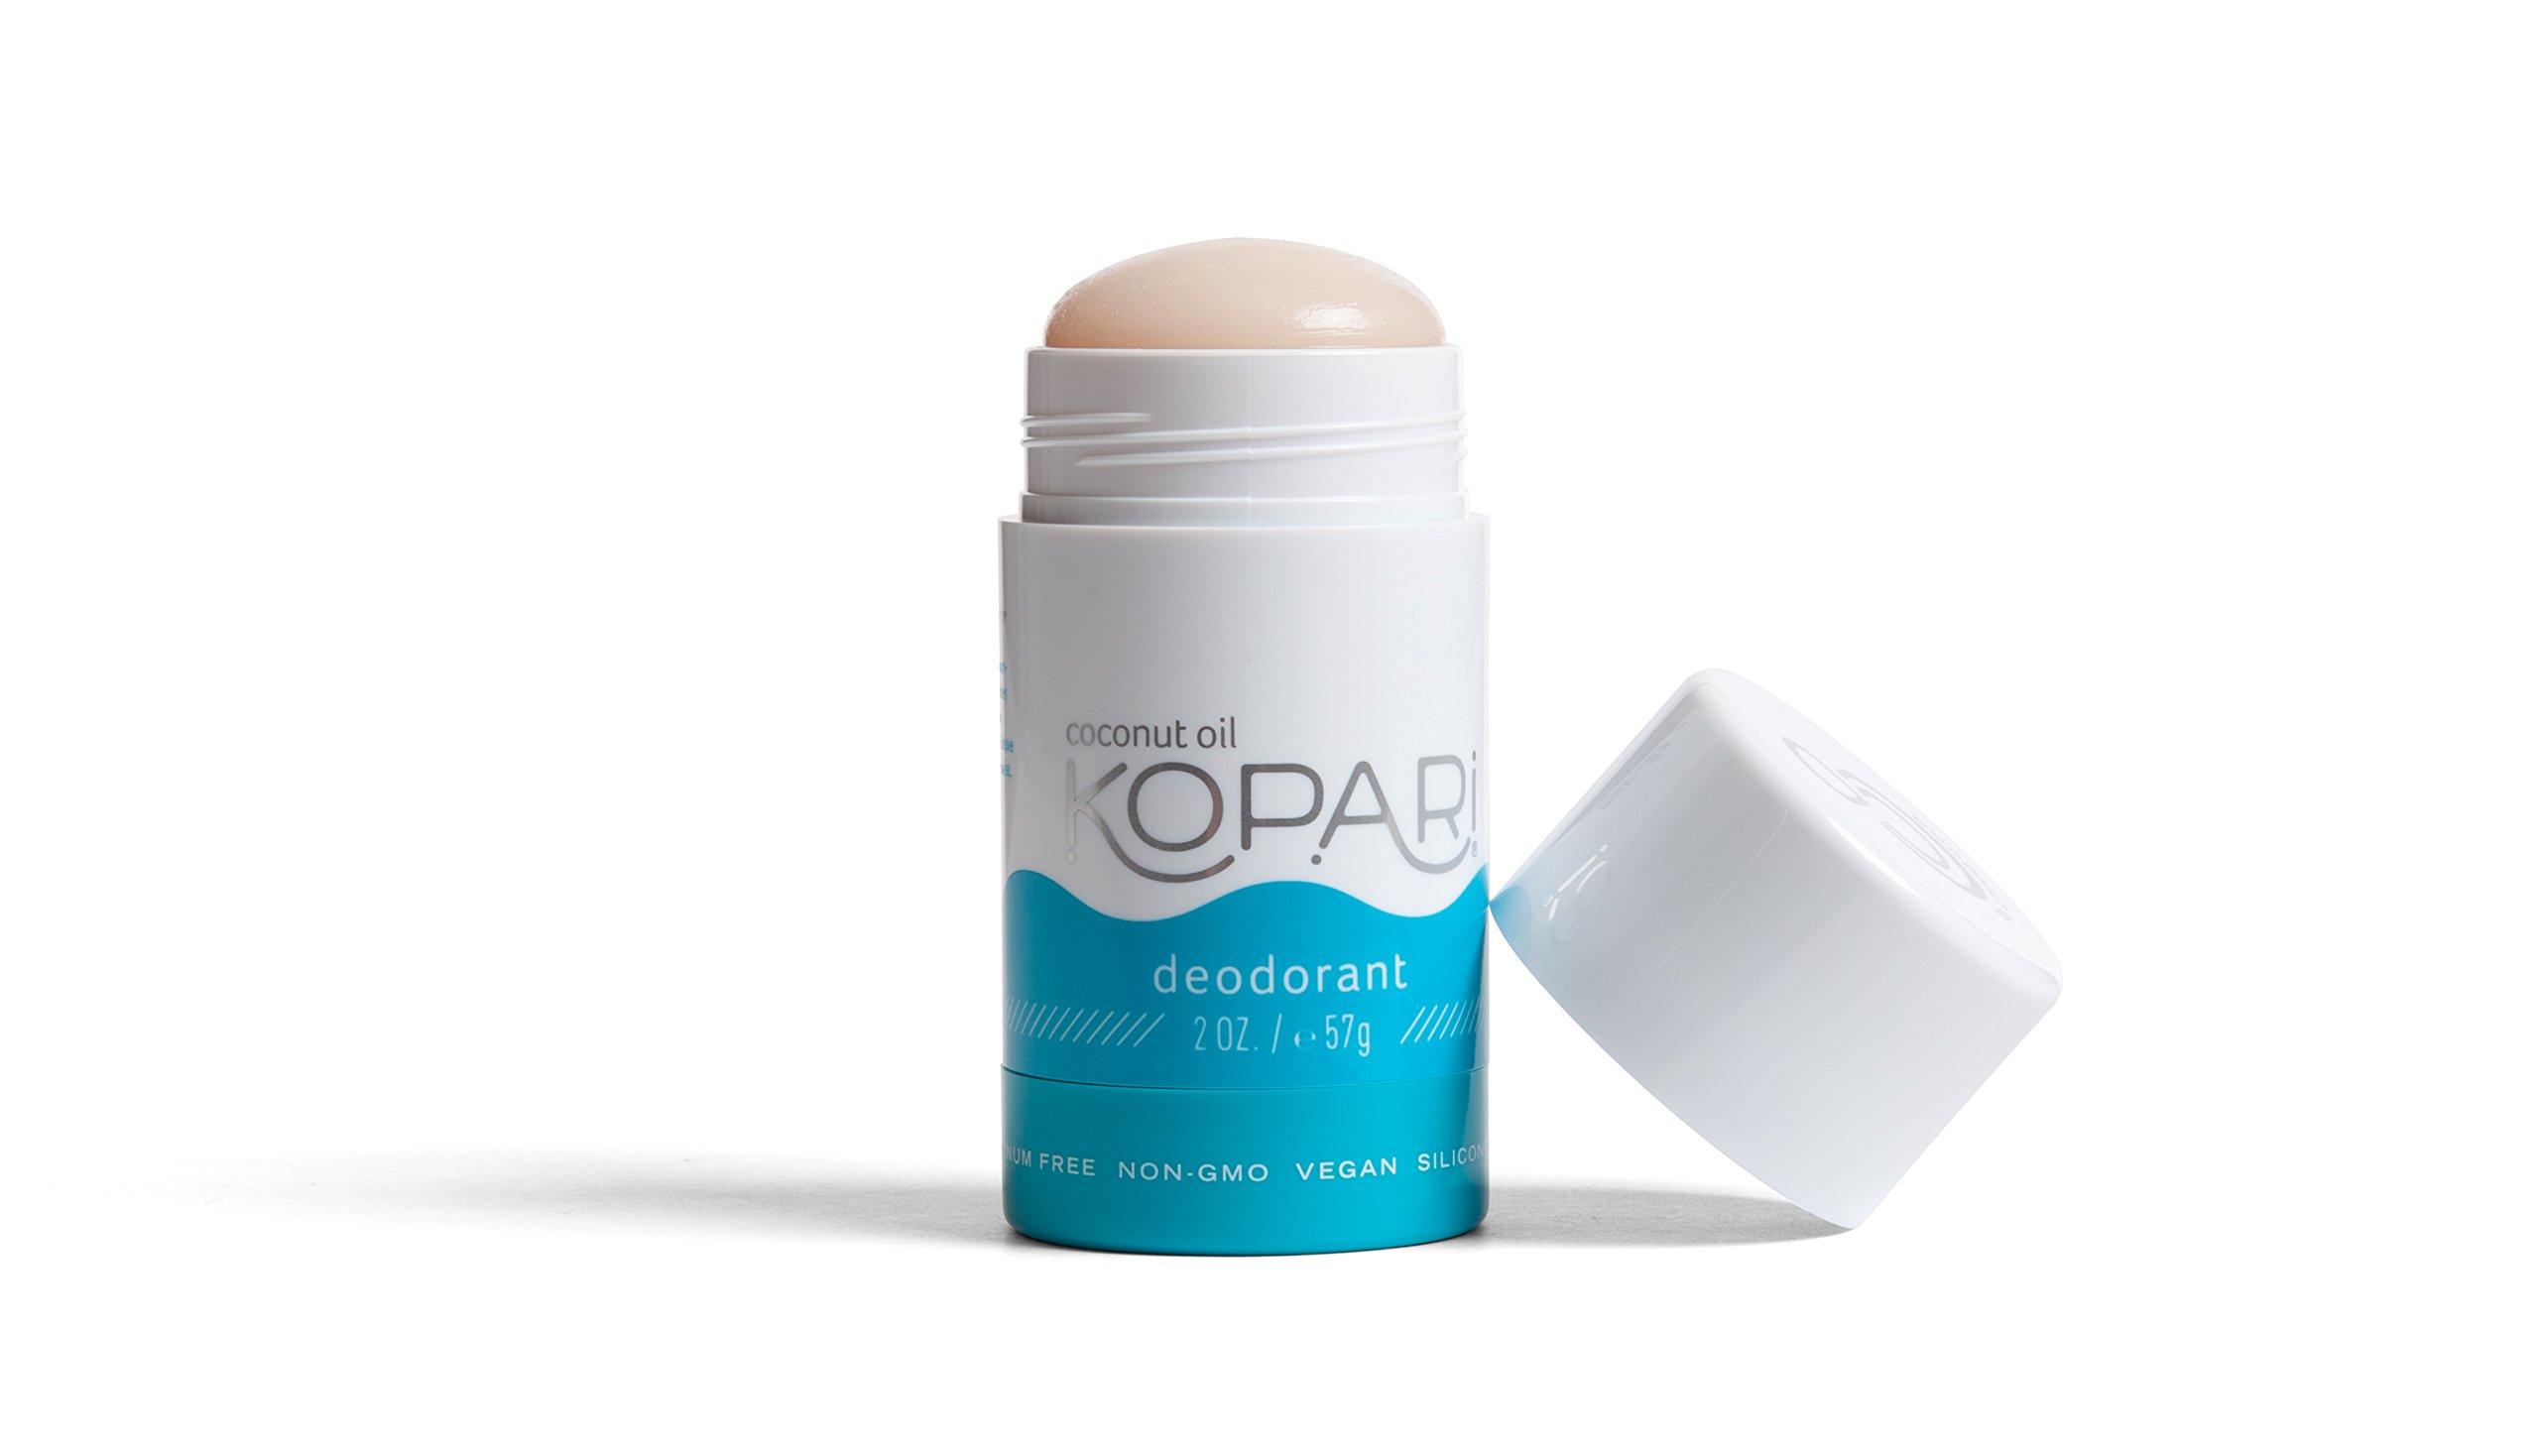 Kopari Aluminum-Free Deodorant | Non-Toxic, Paraben Free, Gluten Free & Cruelty Free Men's and Women's Deodorant | Made with Organic Coconut Oil | 2.0 oz by Kopari (Image #2)